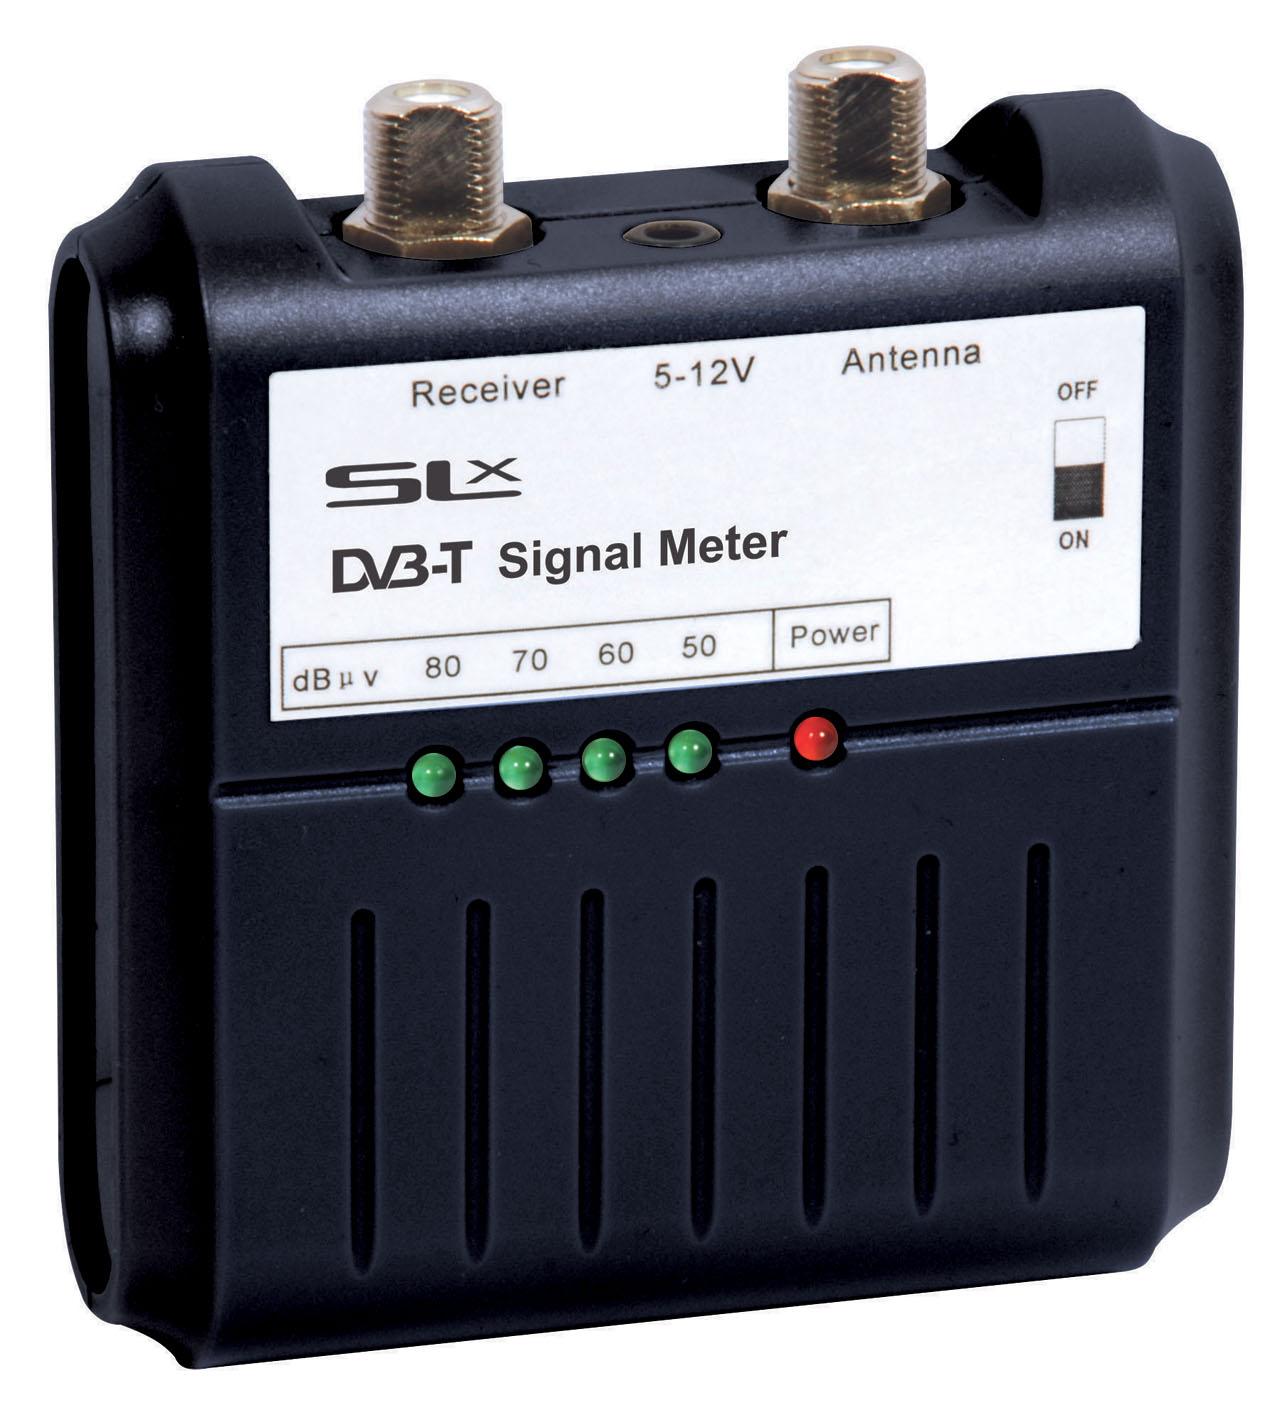 Coaxial Cable Signal Strength Tester : Slx digital tv signal meter philex electronics ltd